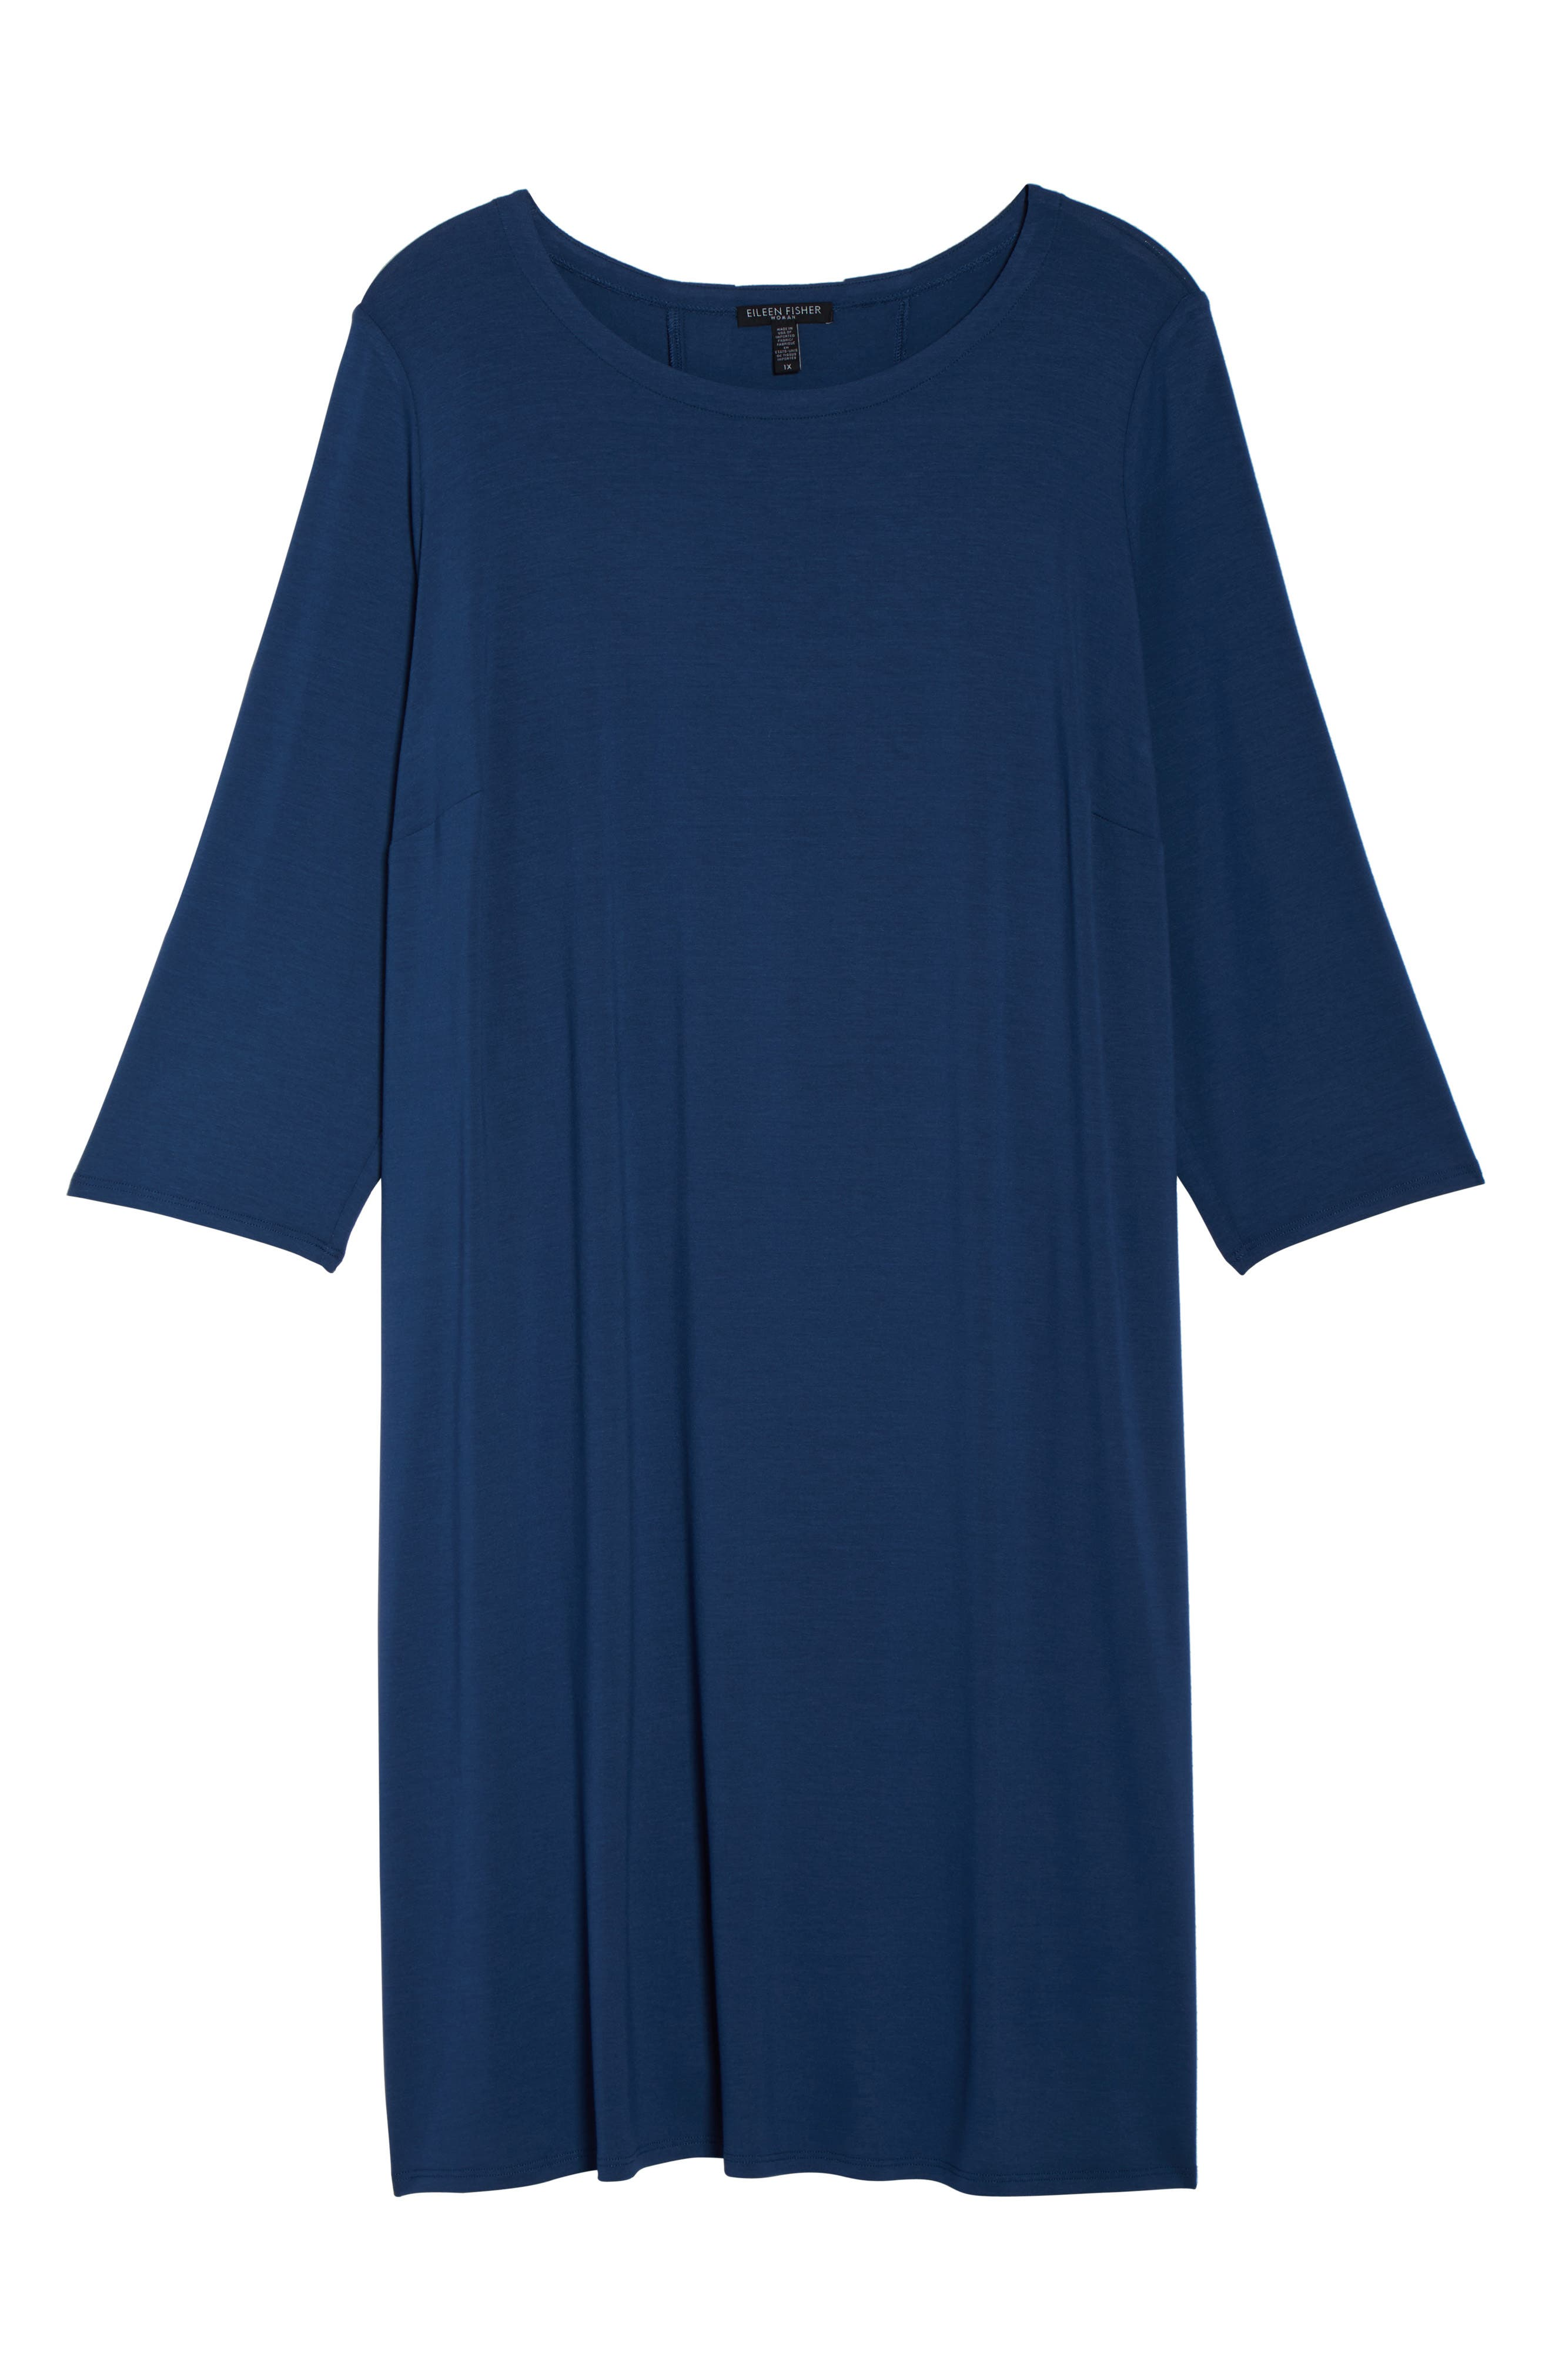 Jewel Neck Tie Back Dress,                             Alternate thumbnail 6, color,                             Denim